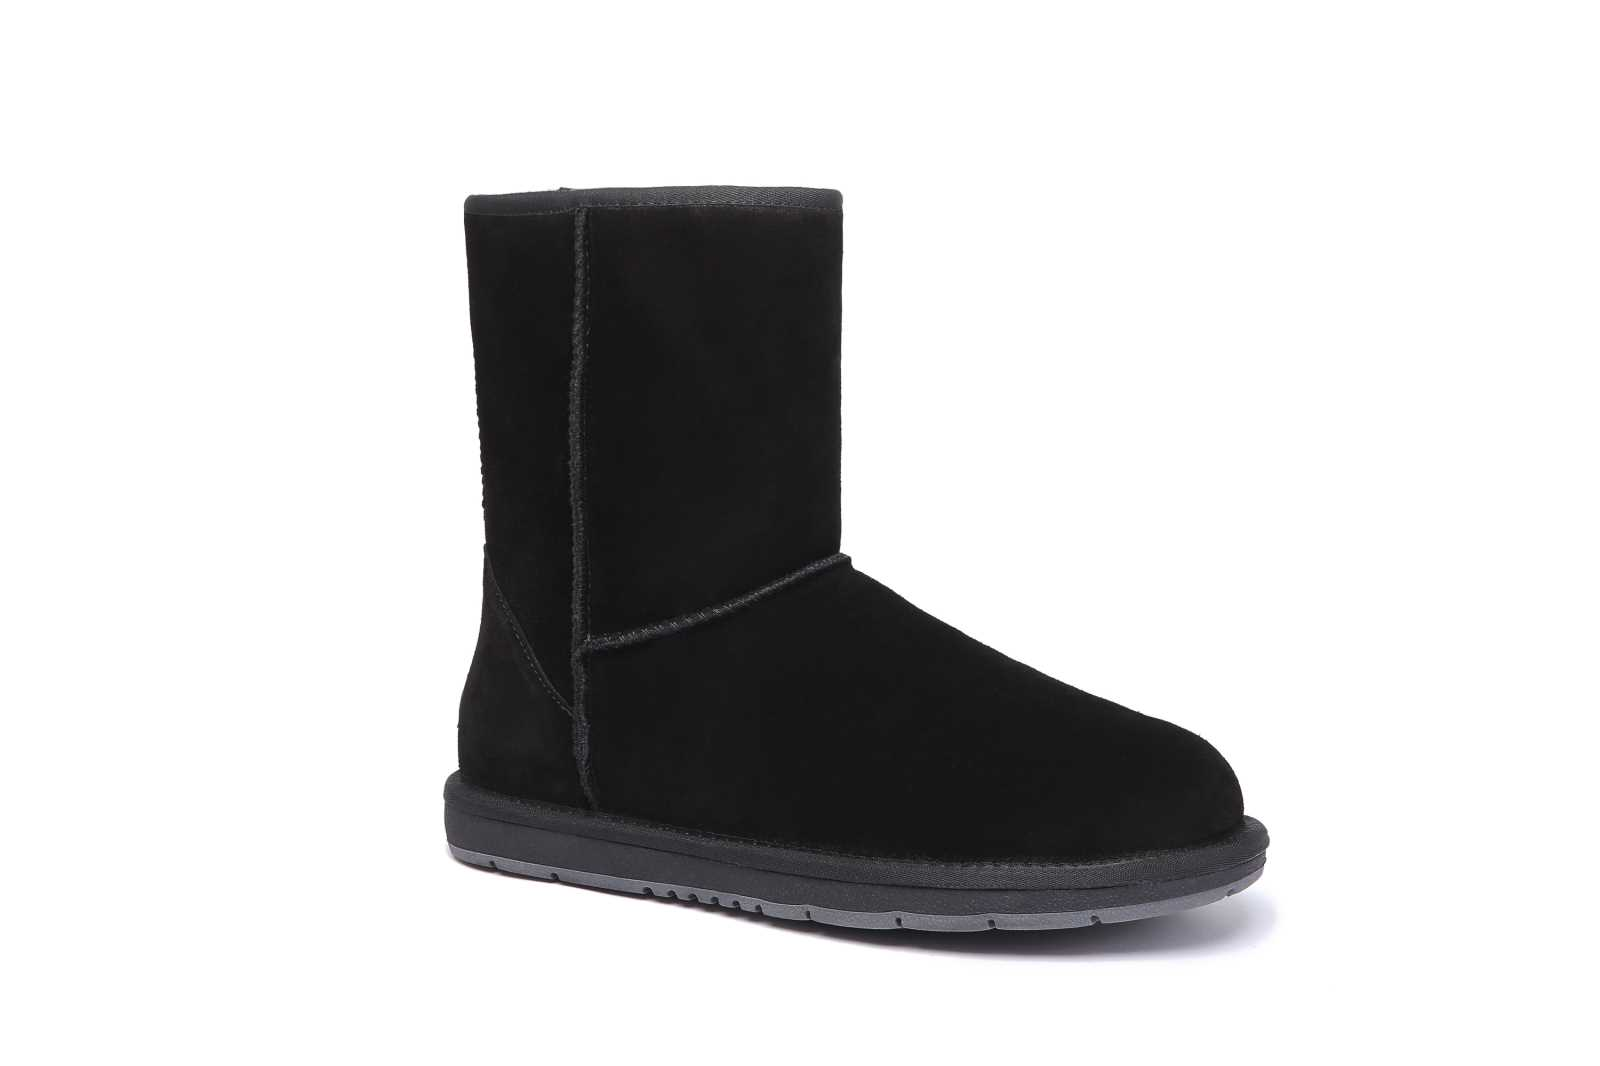 7c1bac2ab45 UGG 15810 Short Classic Boots Premium Australian Sheepskin Suede UGG Boots